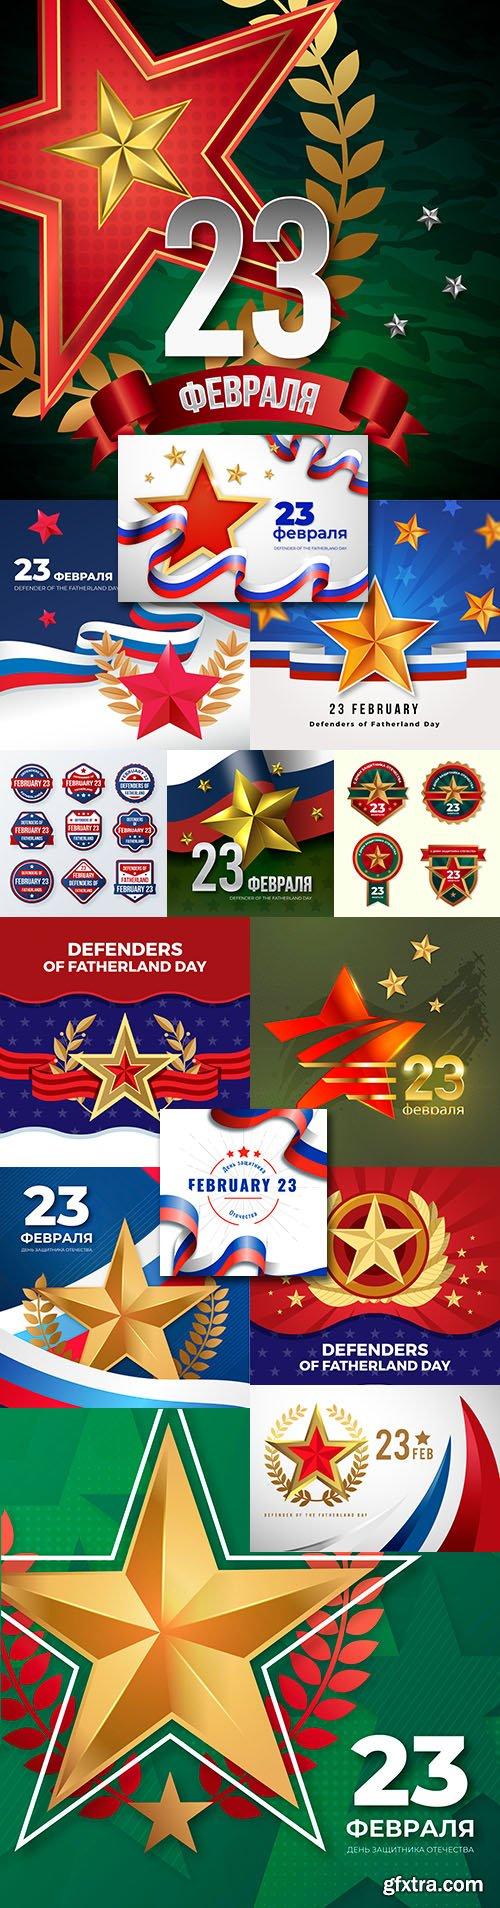 February 23 Defender of Fatherland day illustration flat design 3